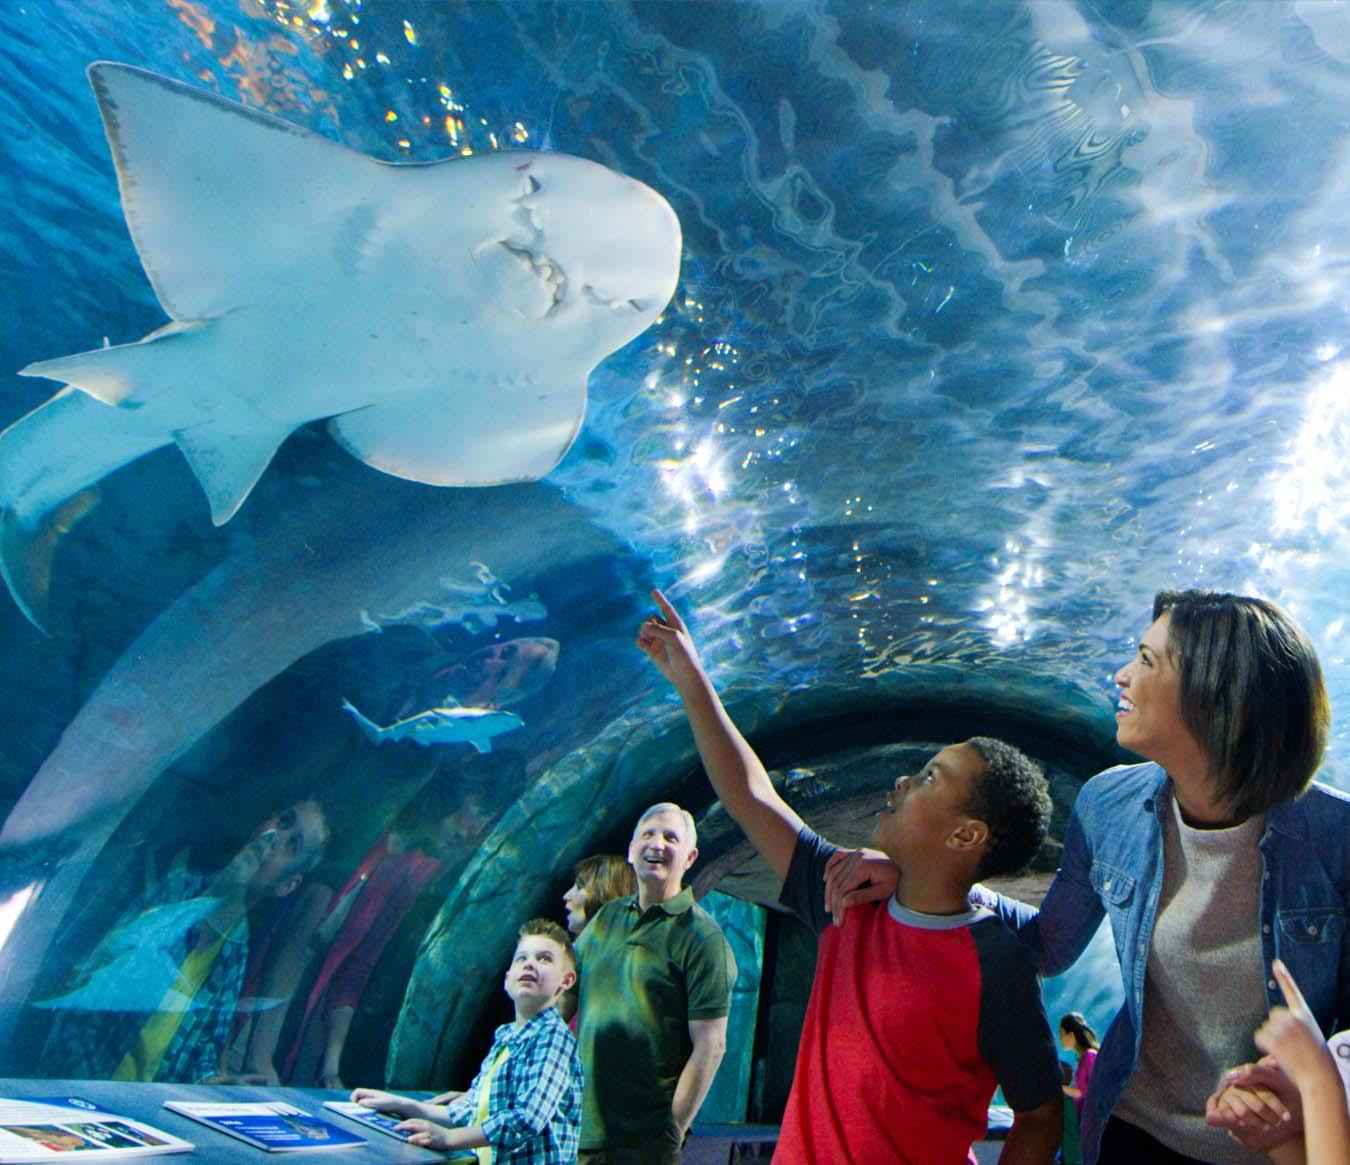 Things to Do in Cincinnati - Newport Aquarium